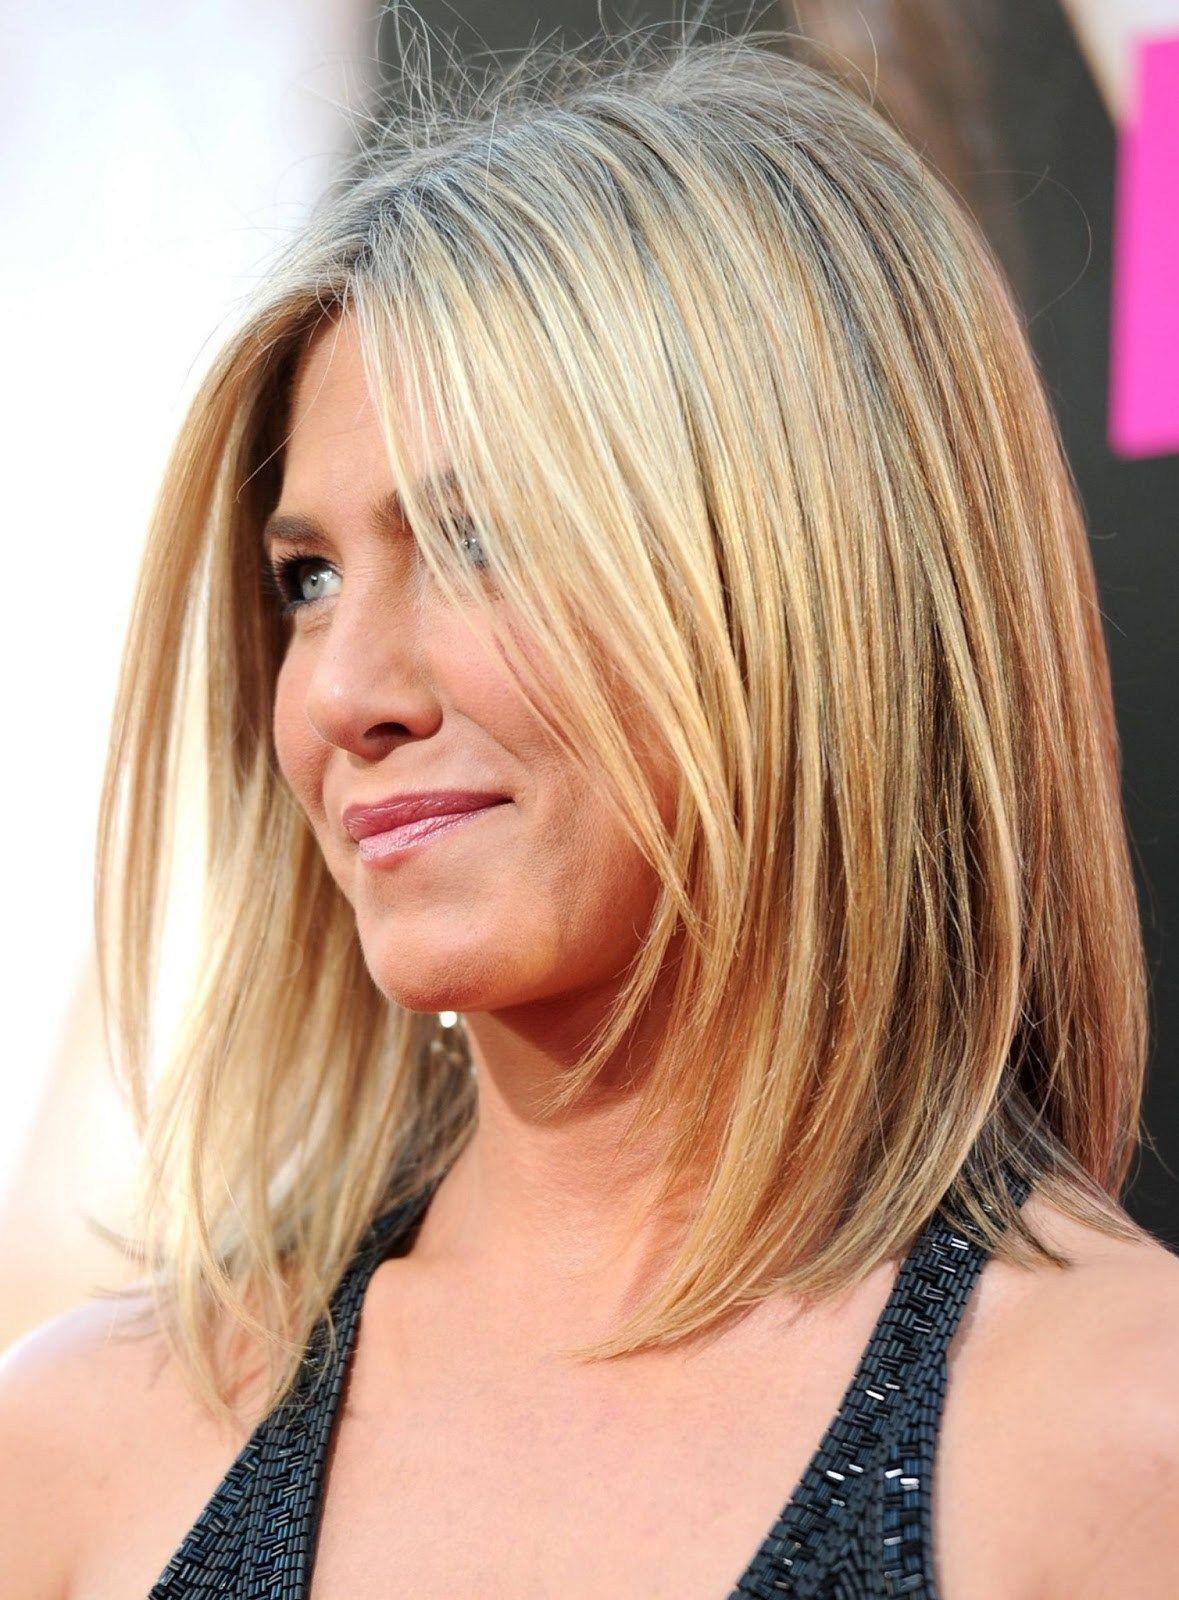 50 hairstyles for thin hair - best haircuts for thinning hair | hair